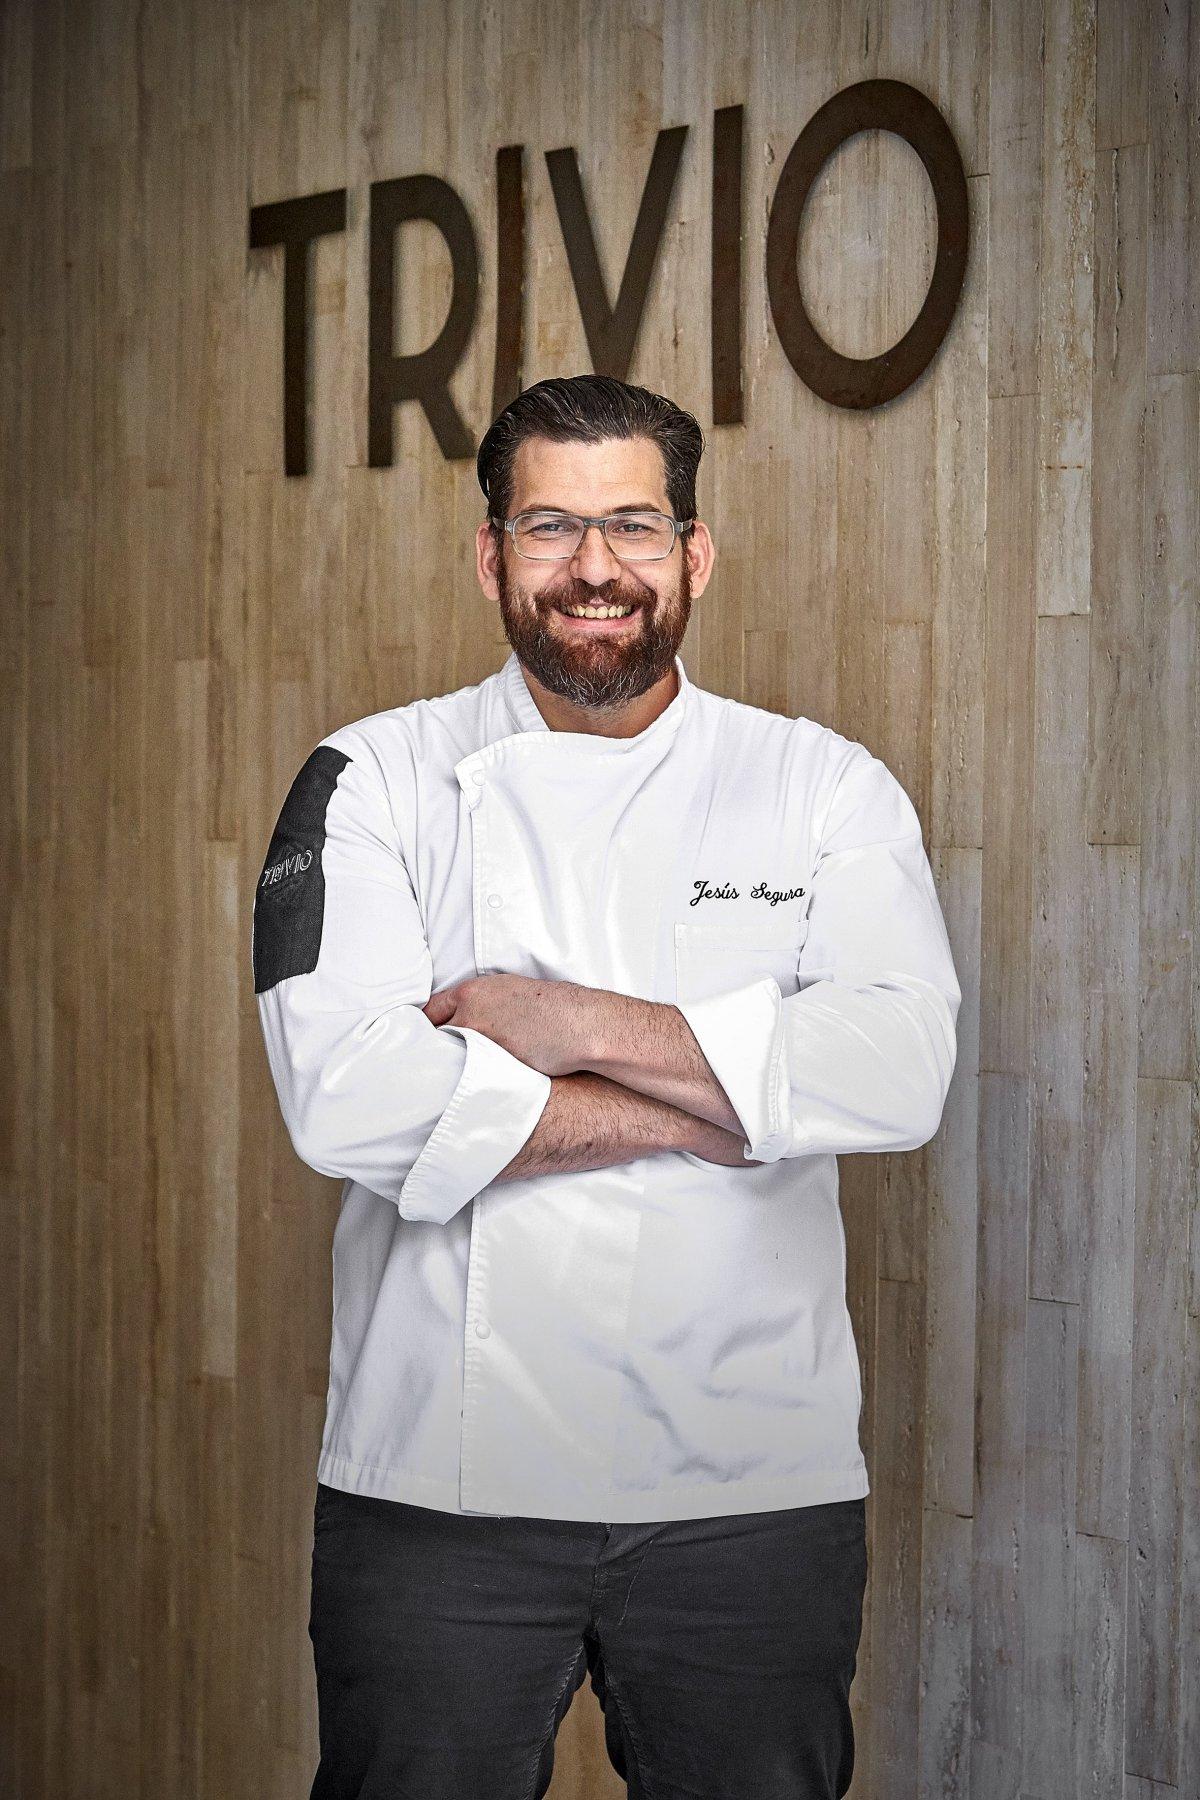 Retrato de Jesús Segura, chef del restaurante Trivio